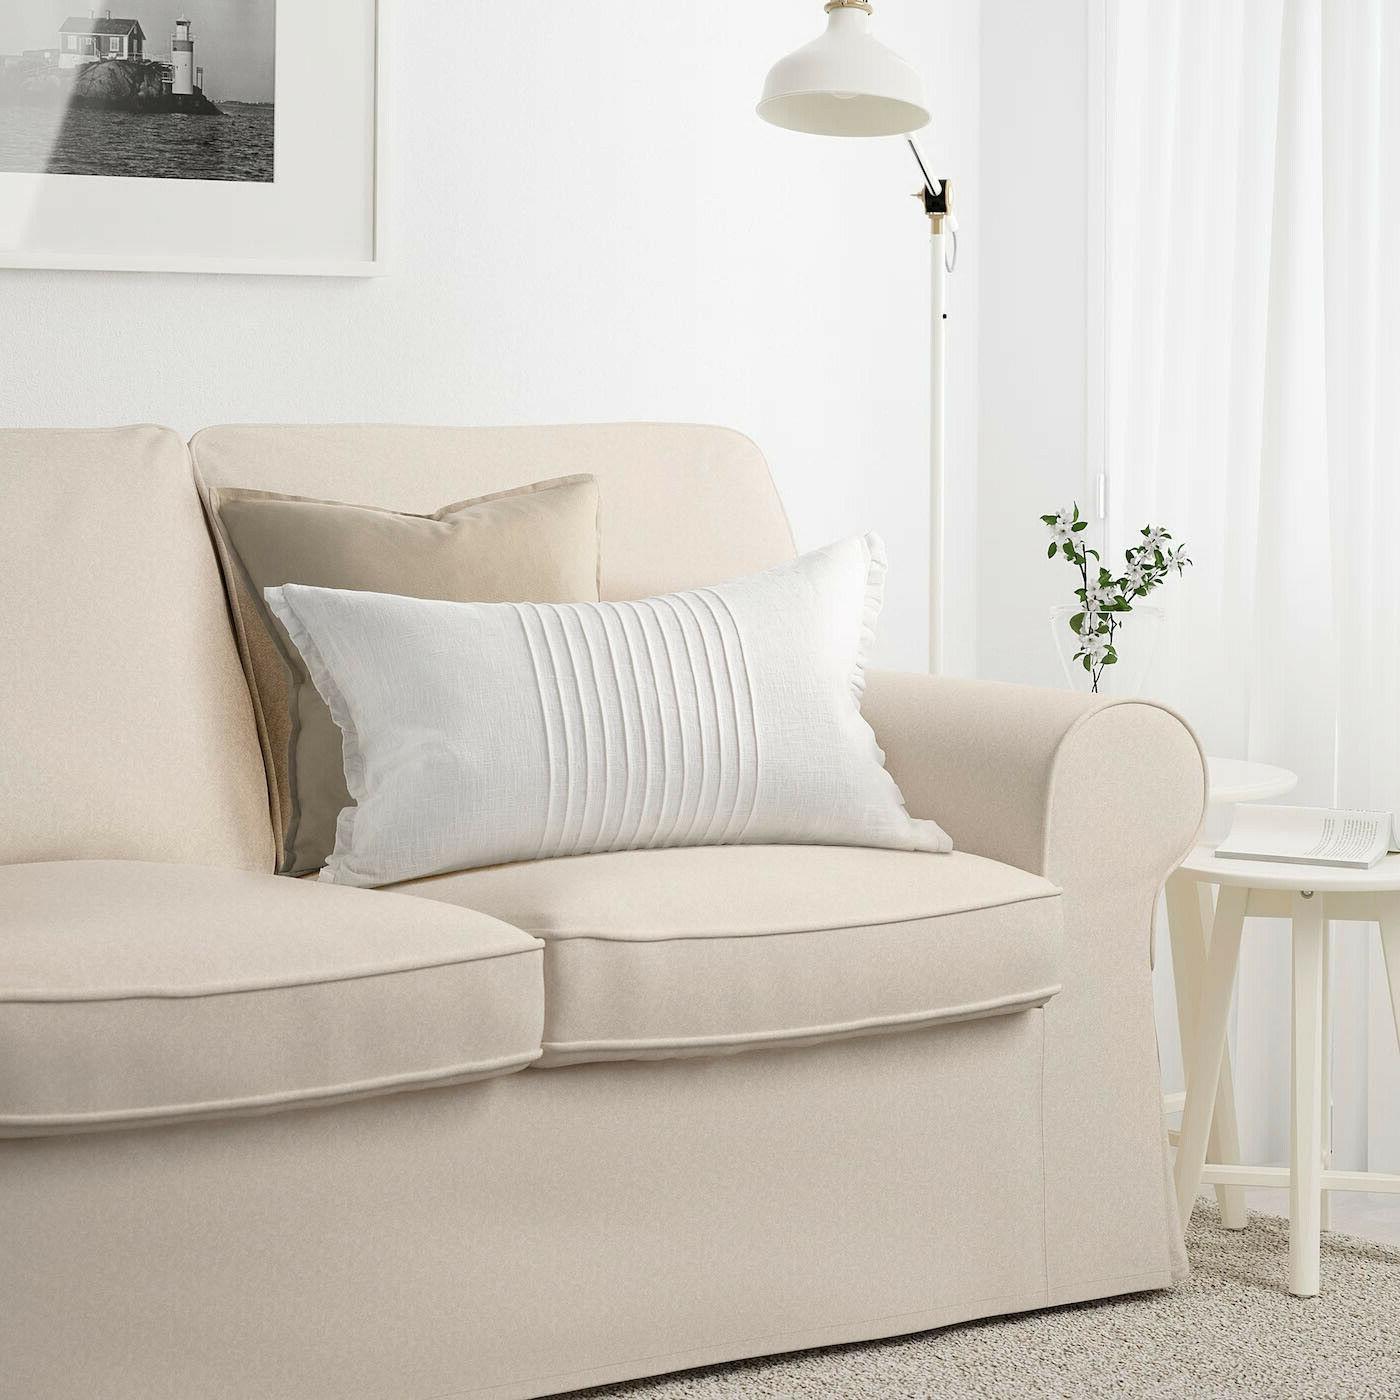 Ikea EKTORP 4-Seat Corner Sofa COVER ONLY Lofallet - NEW